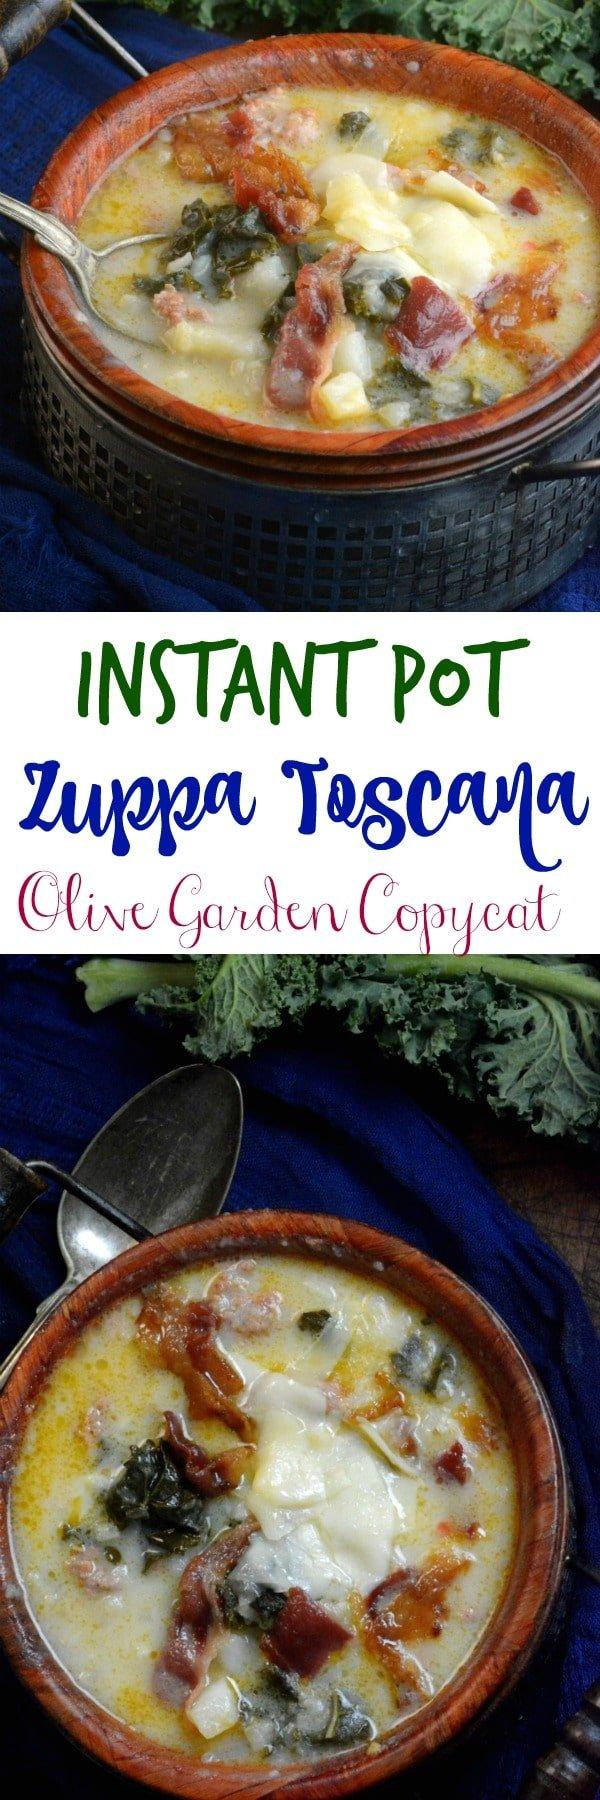 Zuppa toscana olive garden copycat instant pot soup for Zuppa toscana soup olive garden recipe